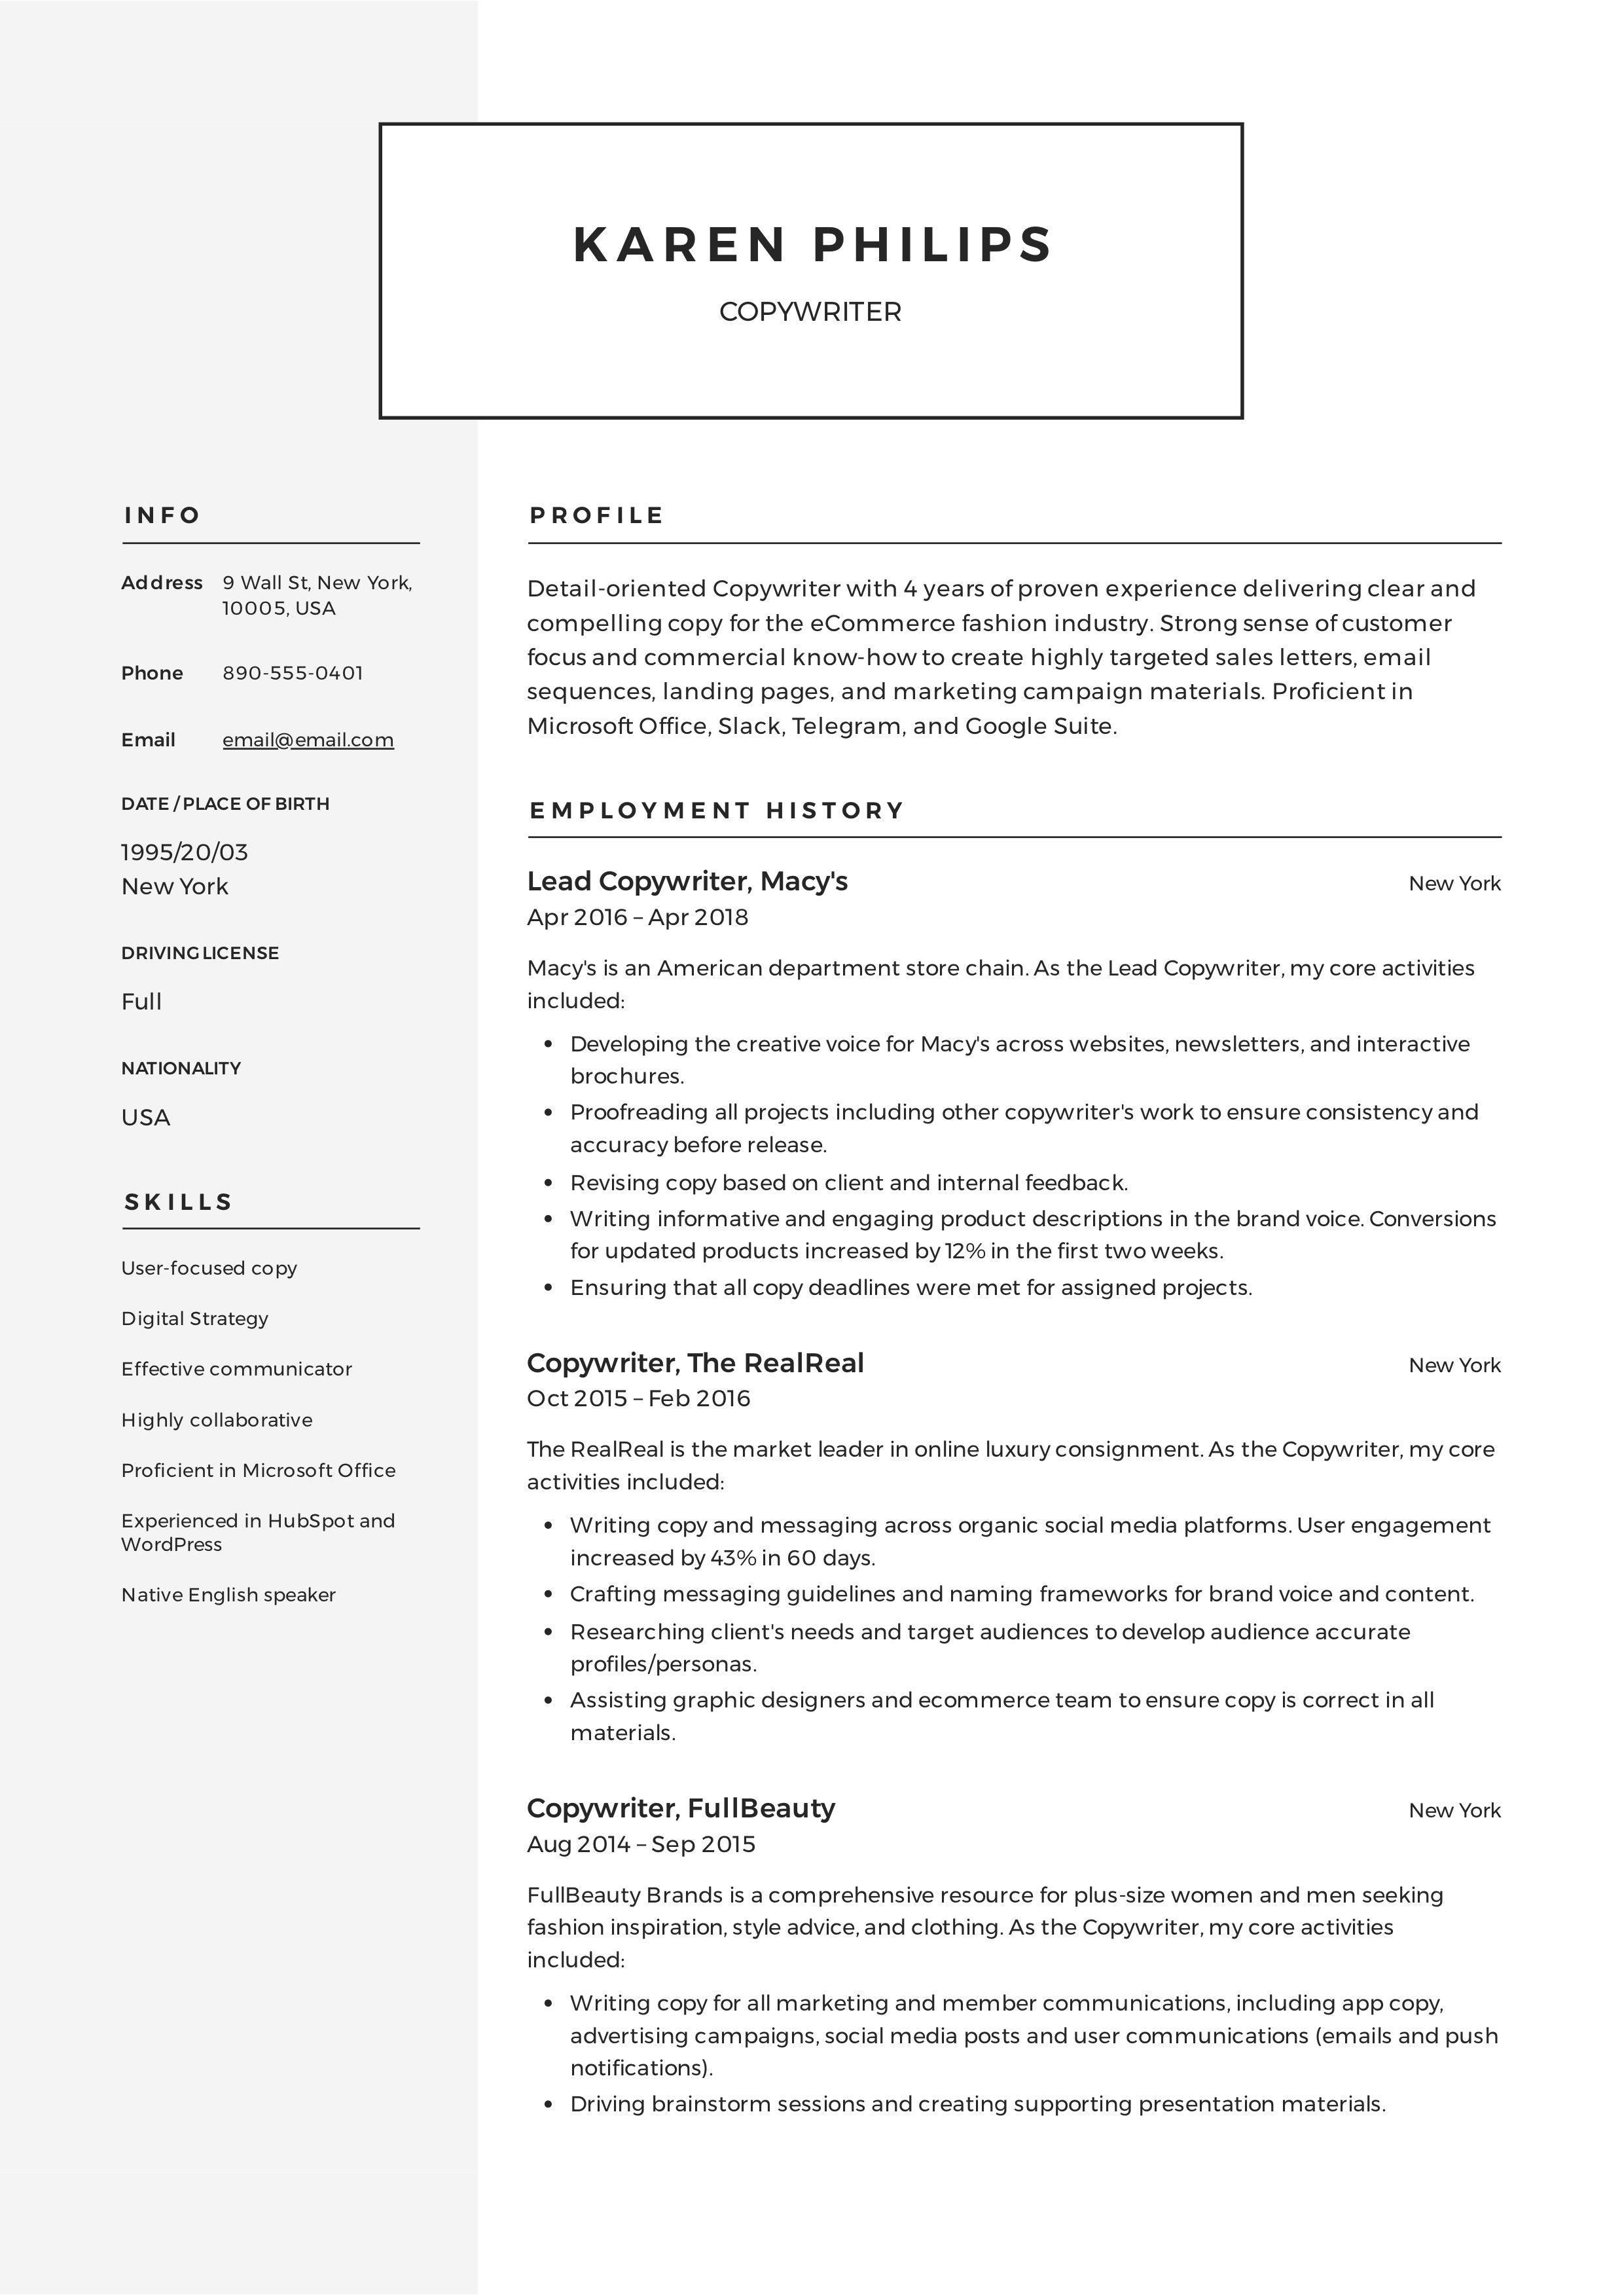 Copywriter resume writing guide in 2020 web designer